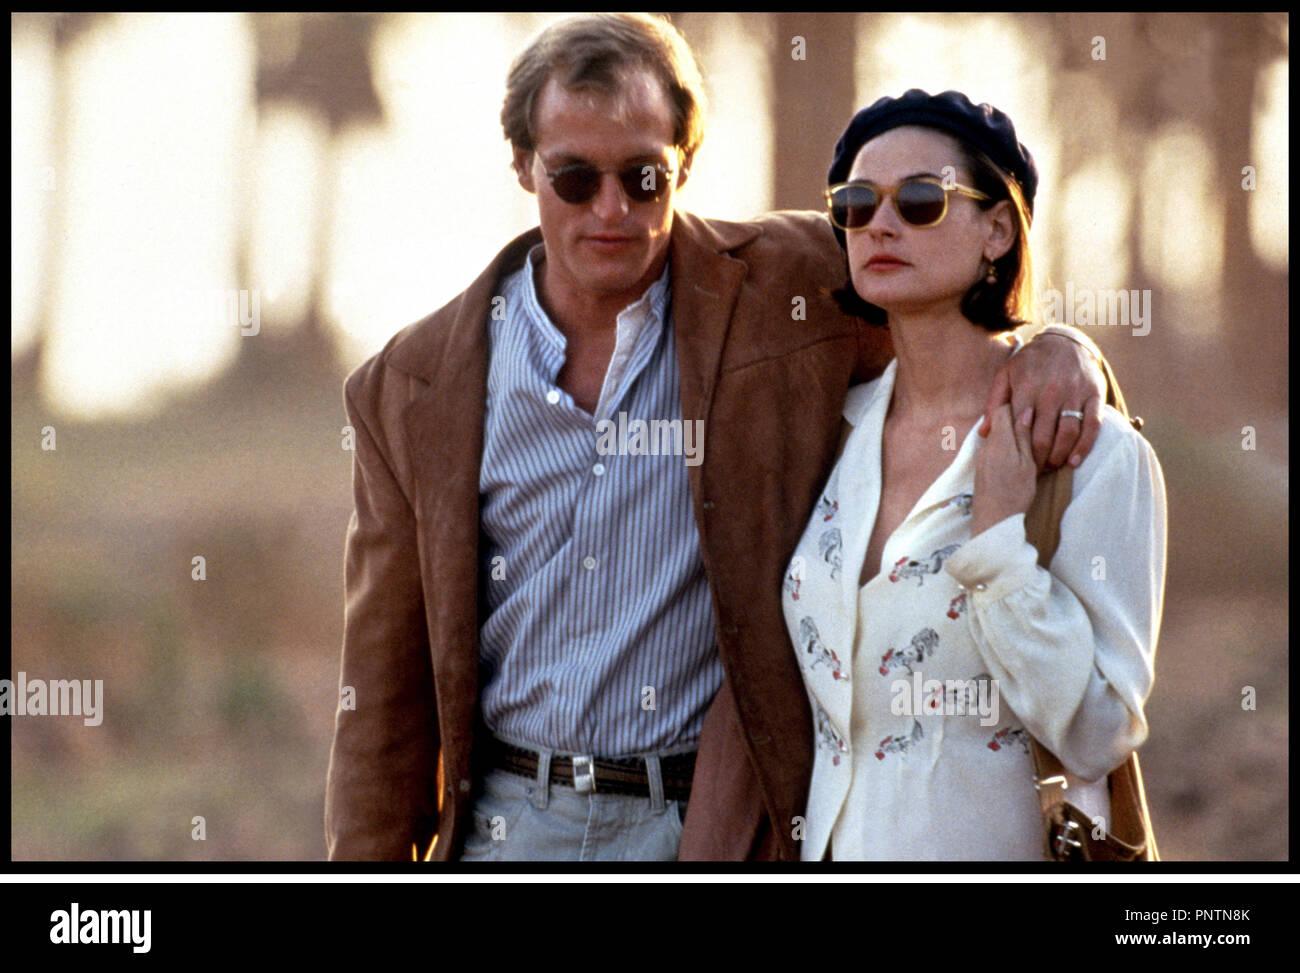 Prod DB ©ÊParamount / DR PROPOSITION INDECENTE (INDECENT PROPOSAL) de Adrian Lyne 1993 USA avec Woody Harrelson et Demi Moore couple, promenade - Stock Image